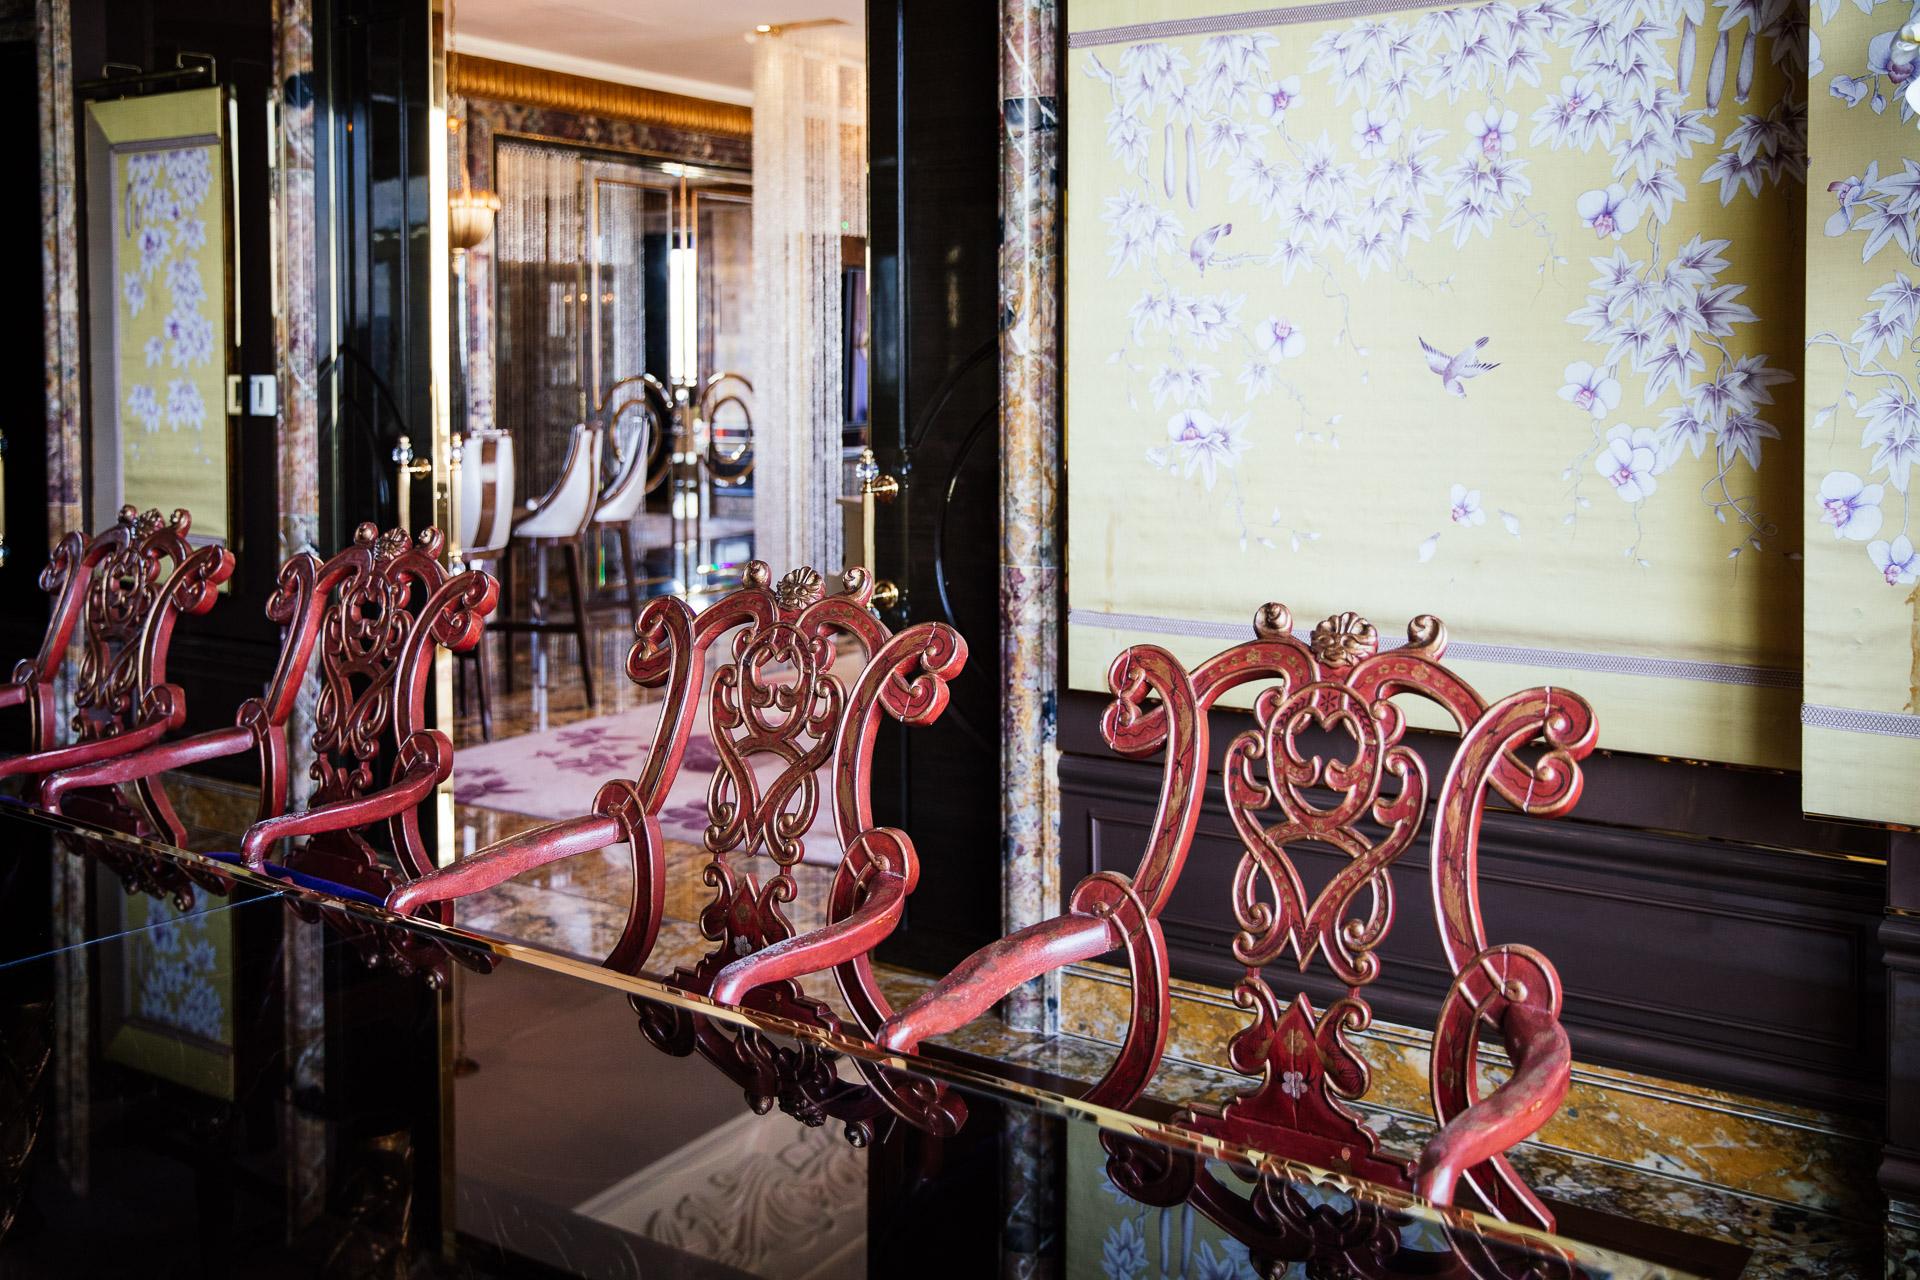 st-regis-singapore-marriott-luxury-hotel-photographer-17.jpg